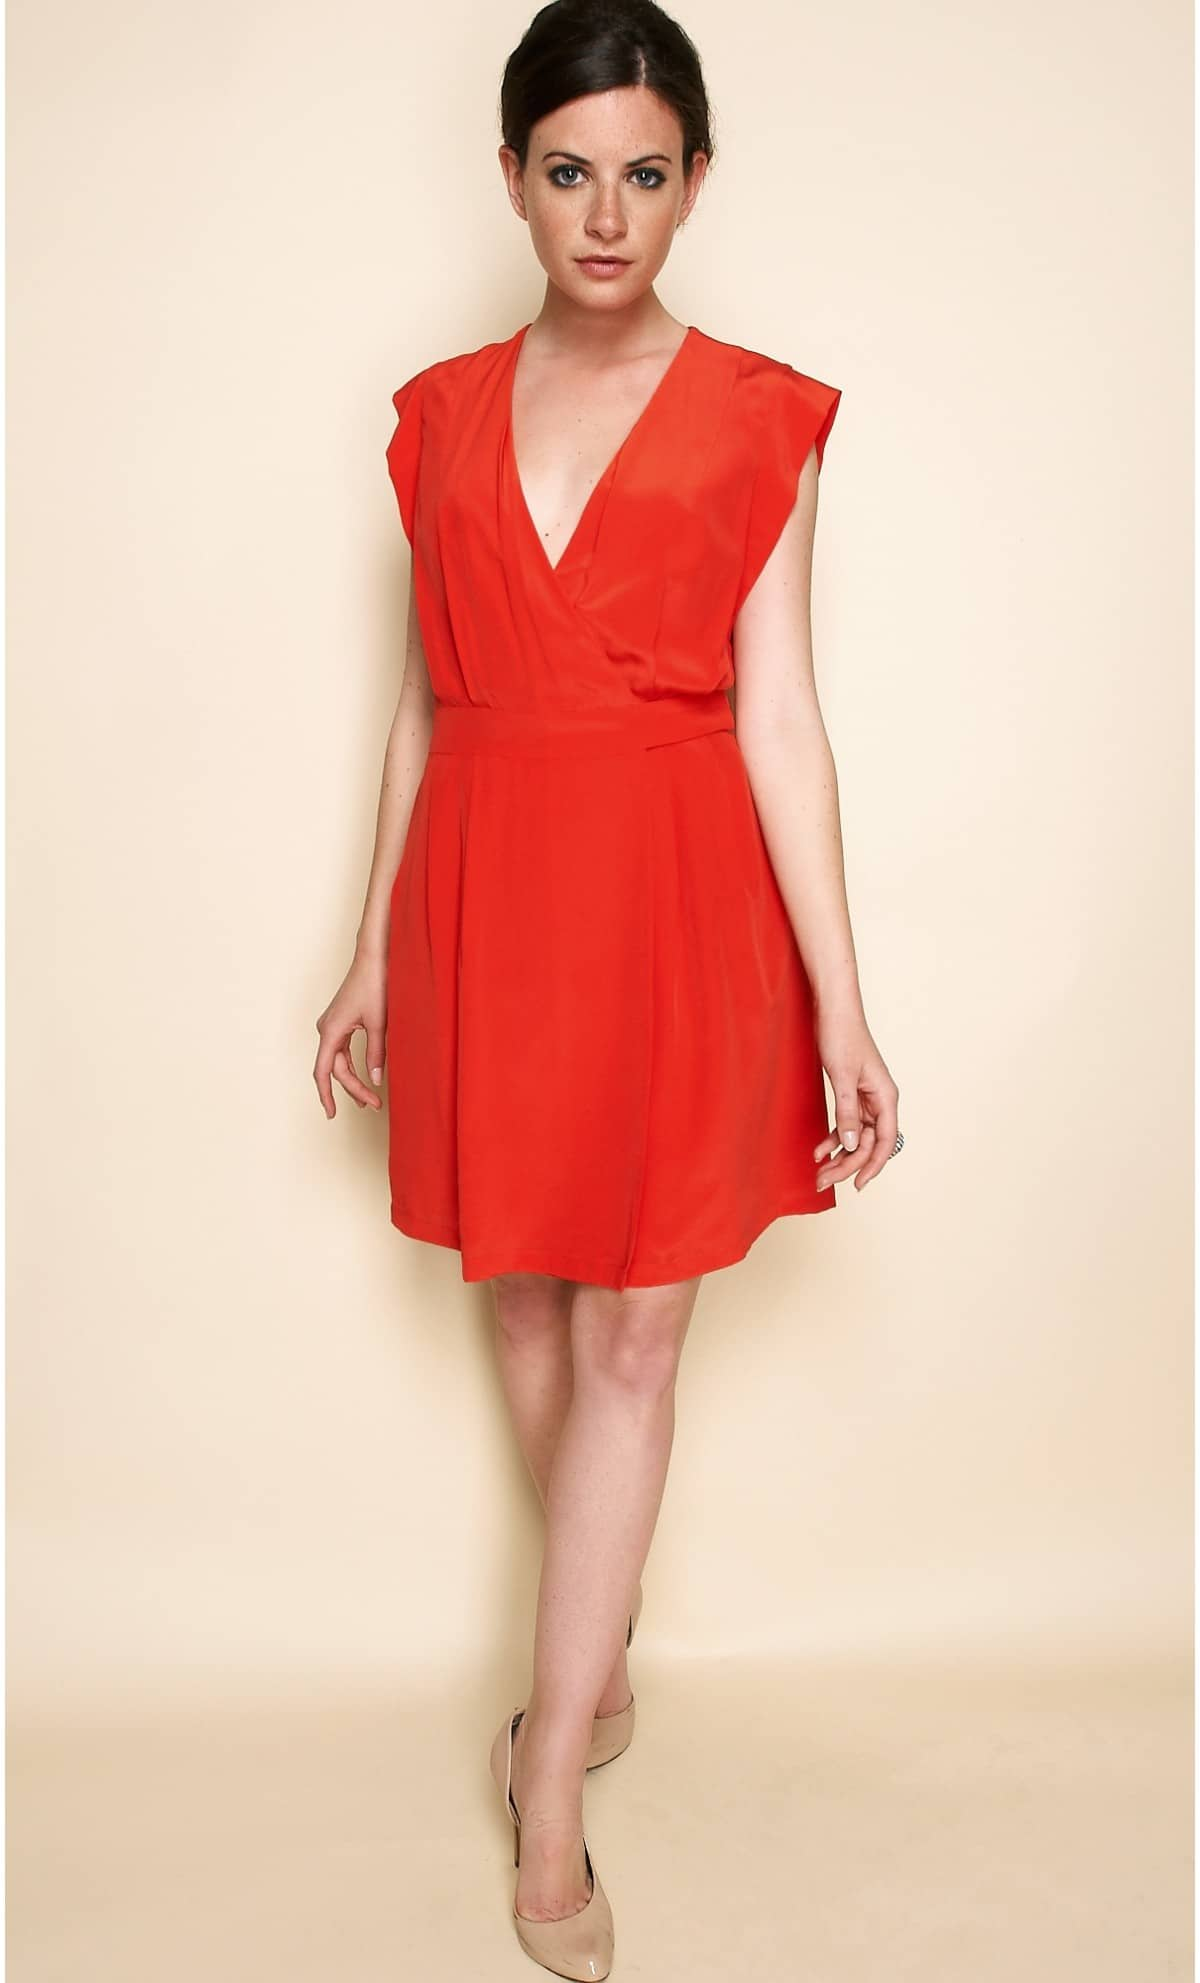 Etre la plus belle en robe corail